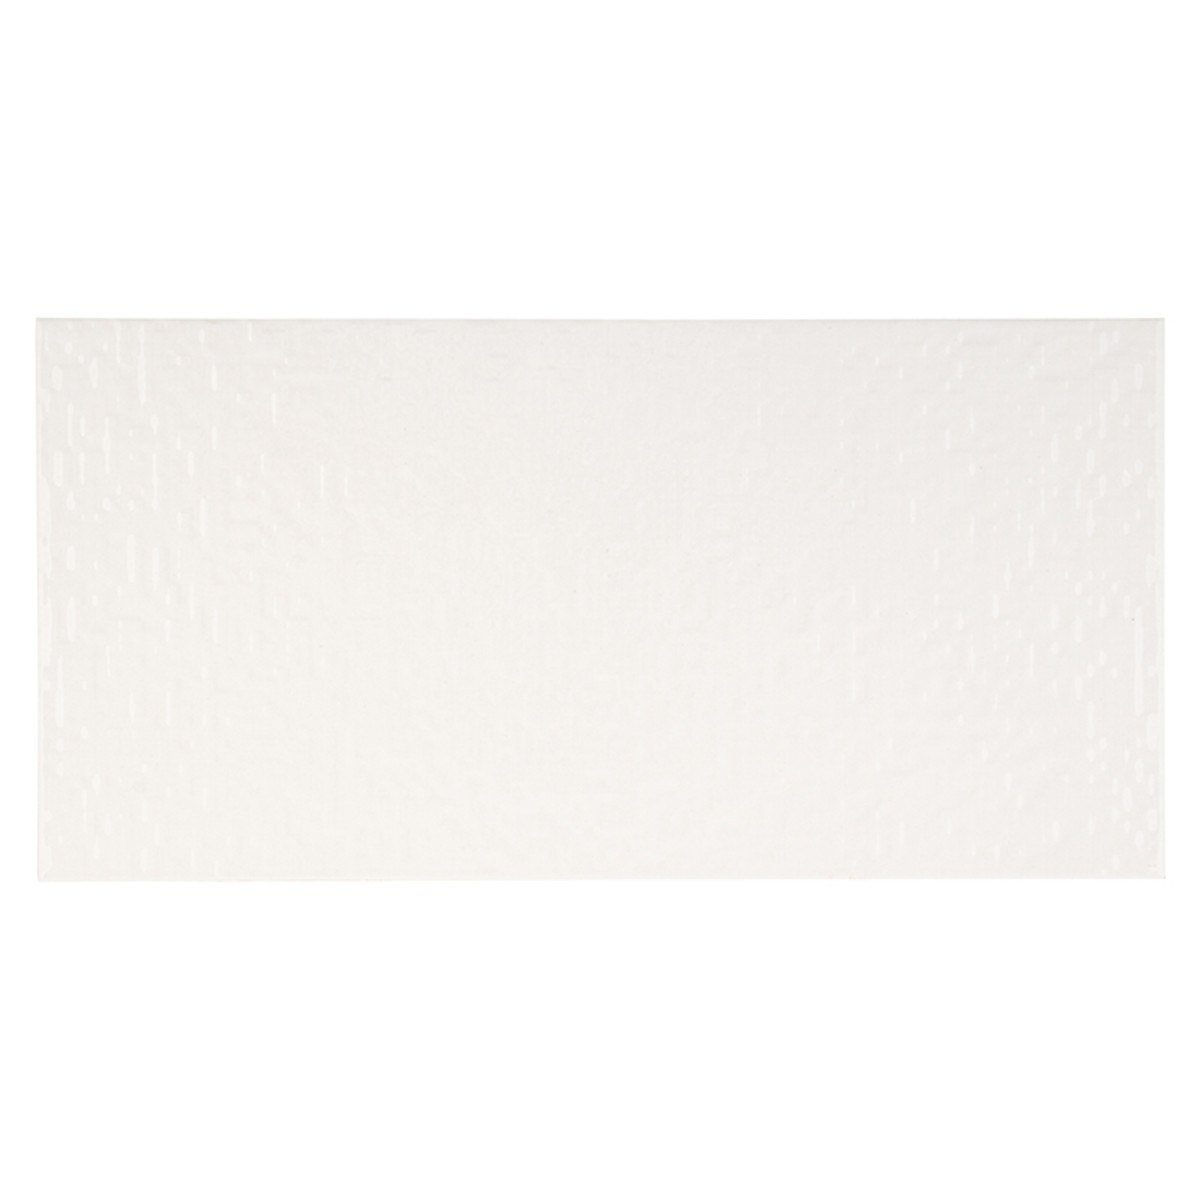 Плитка настенная Фьюжн цвет белый 198х398 см 158 м2